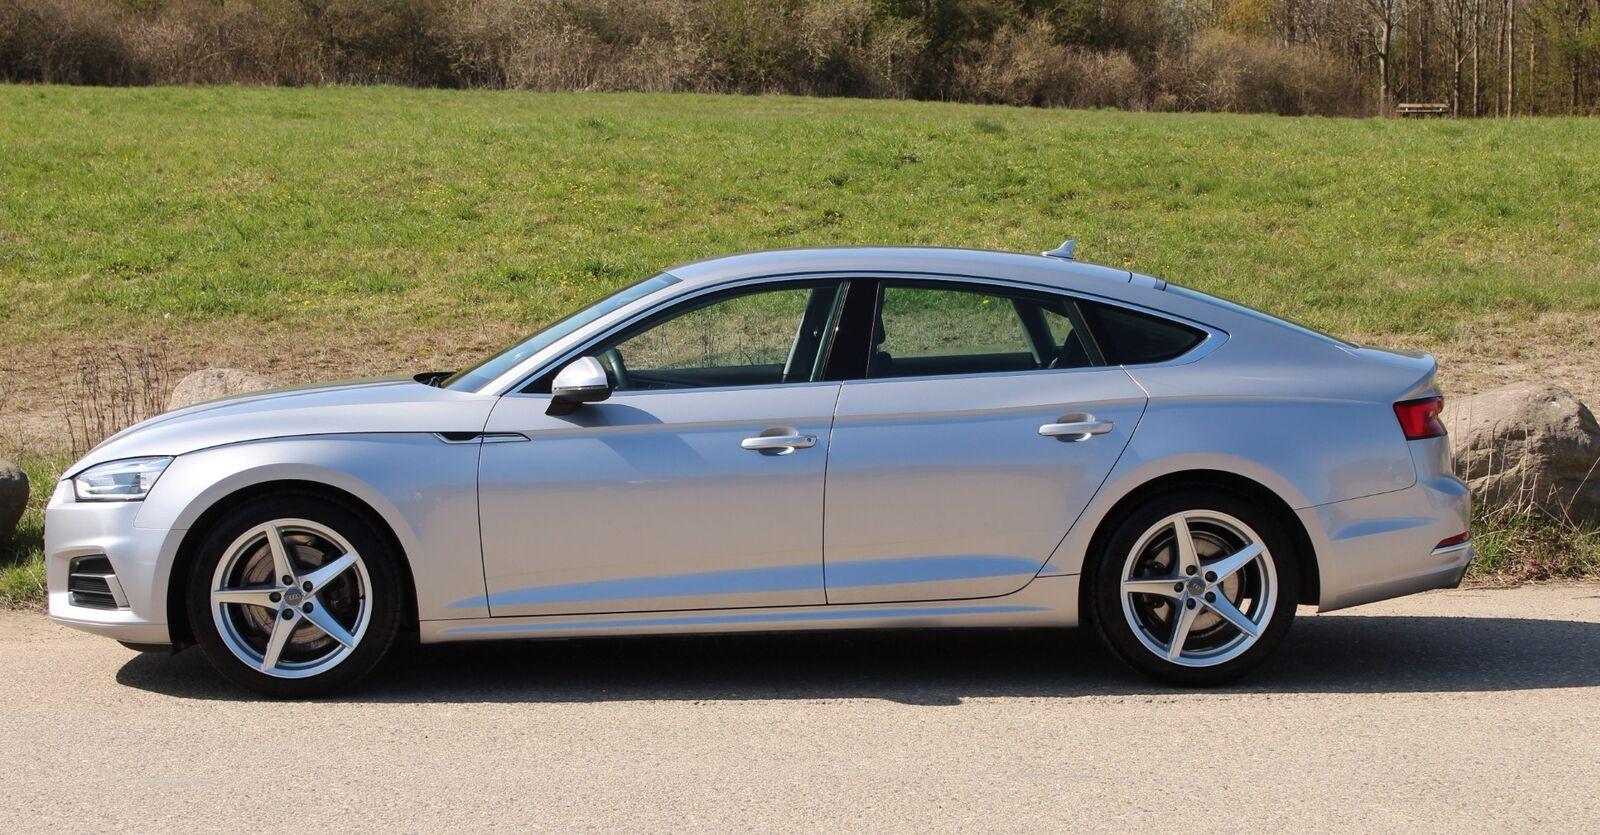 Audi A5 2,0 TFSi 190 Sport Sportback S-tr. - billede 1